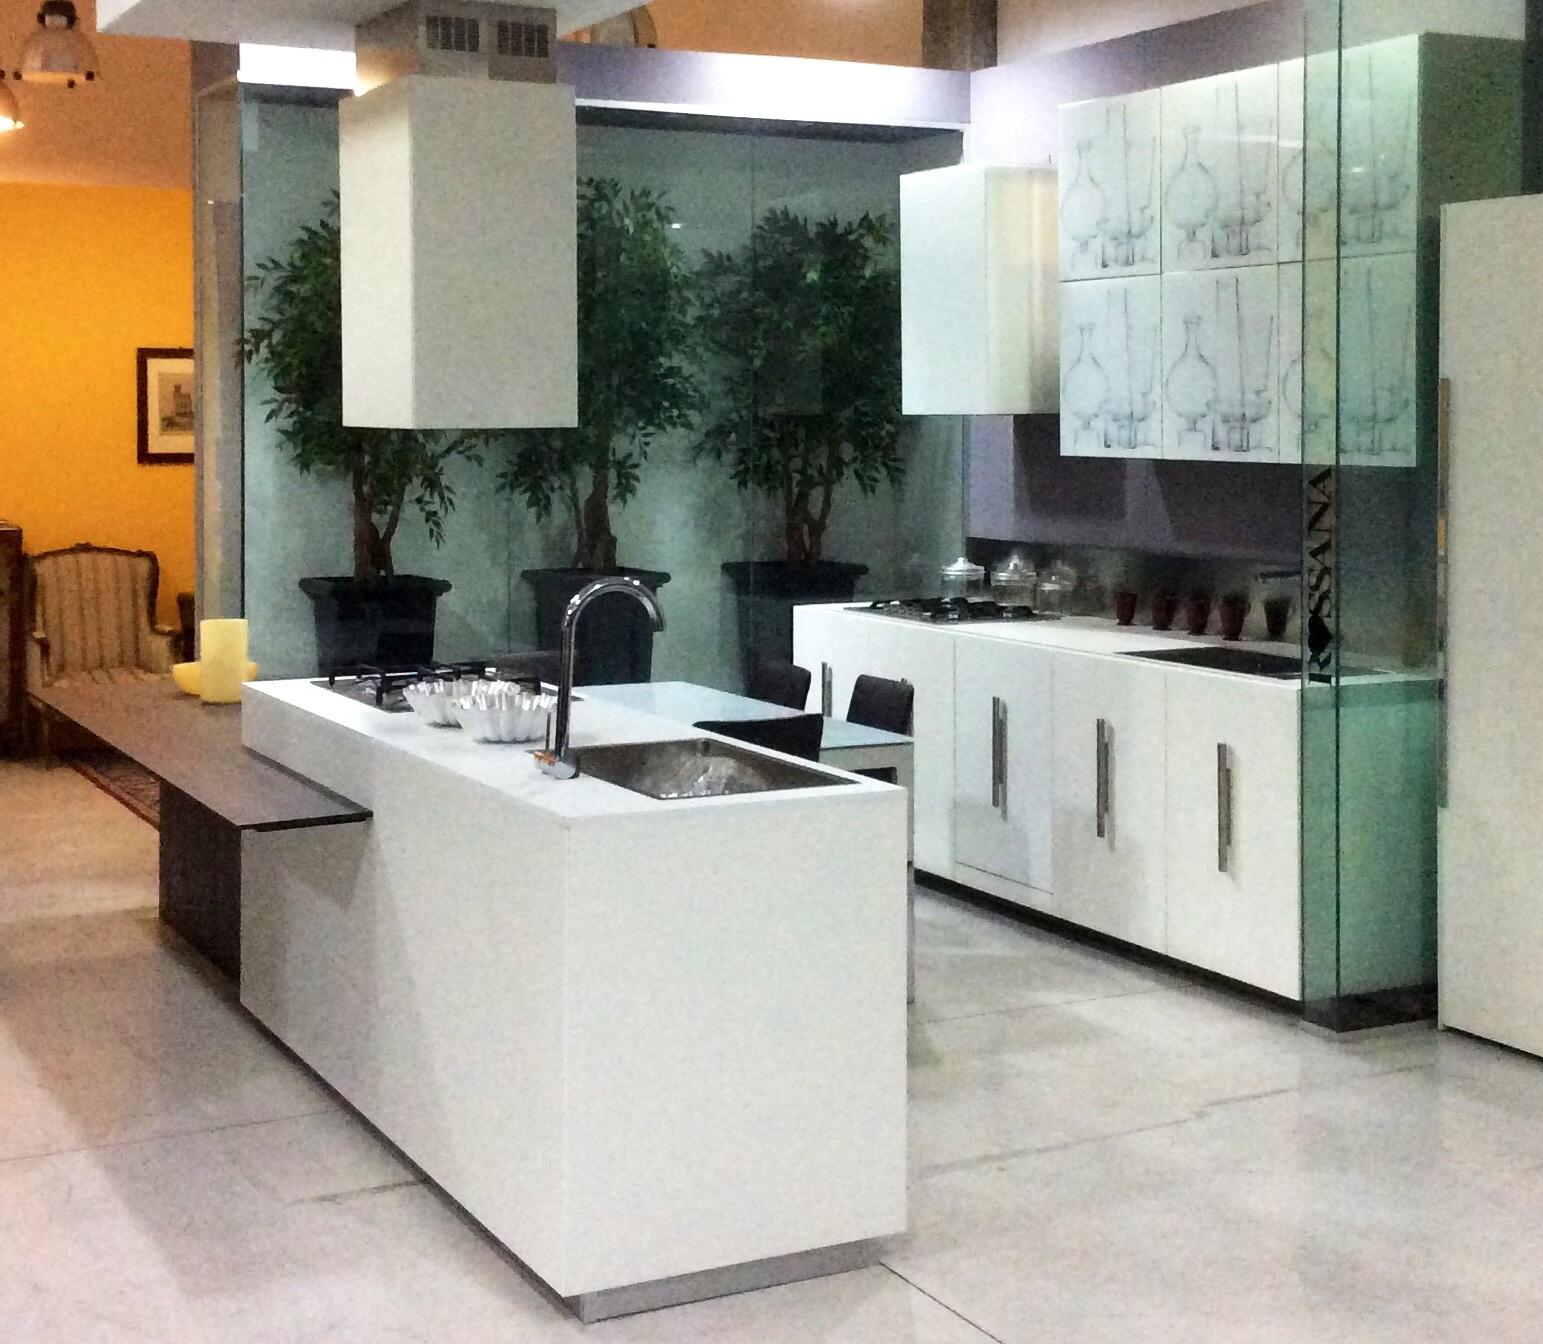 Cucina composit mood design laminato materico bianca cucine a prezzi scontati - Profondita cucina ...